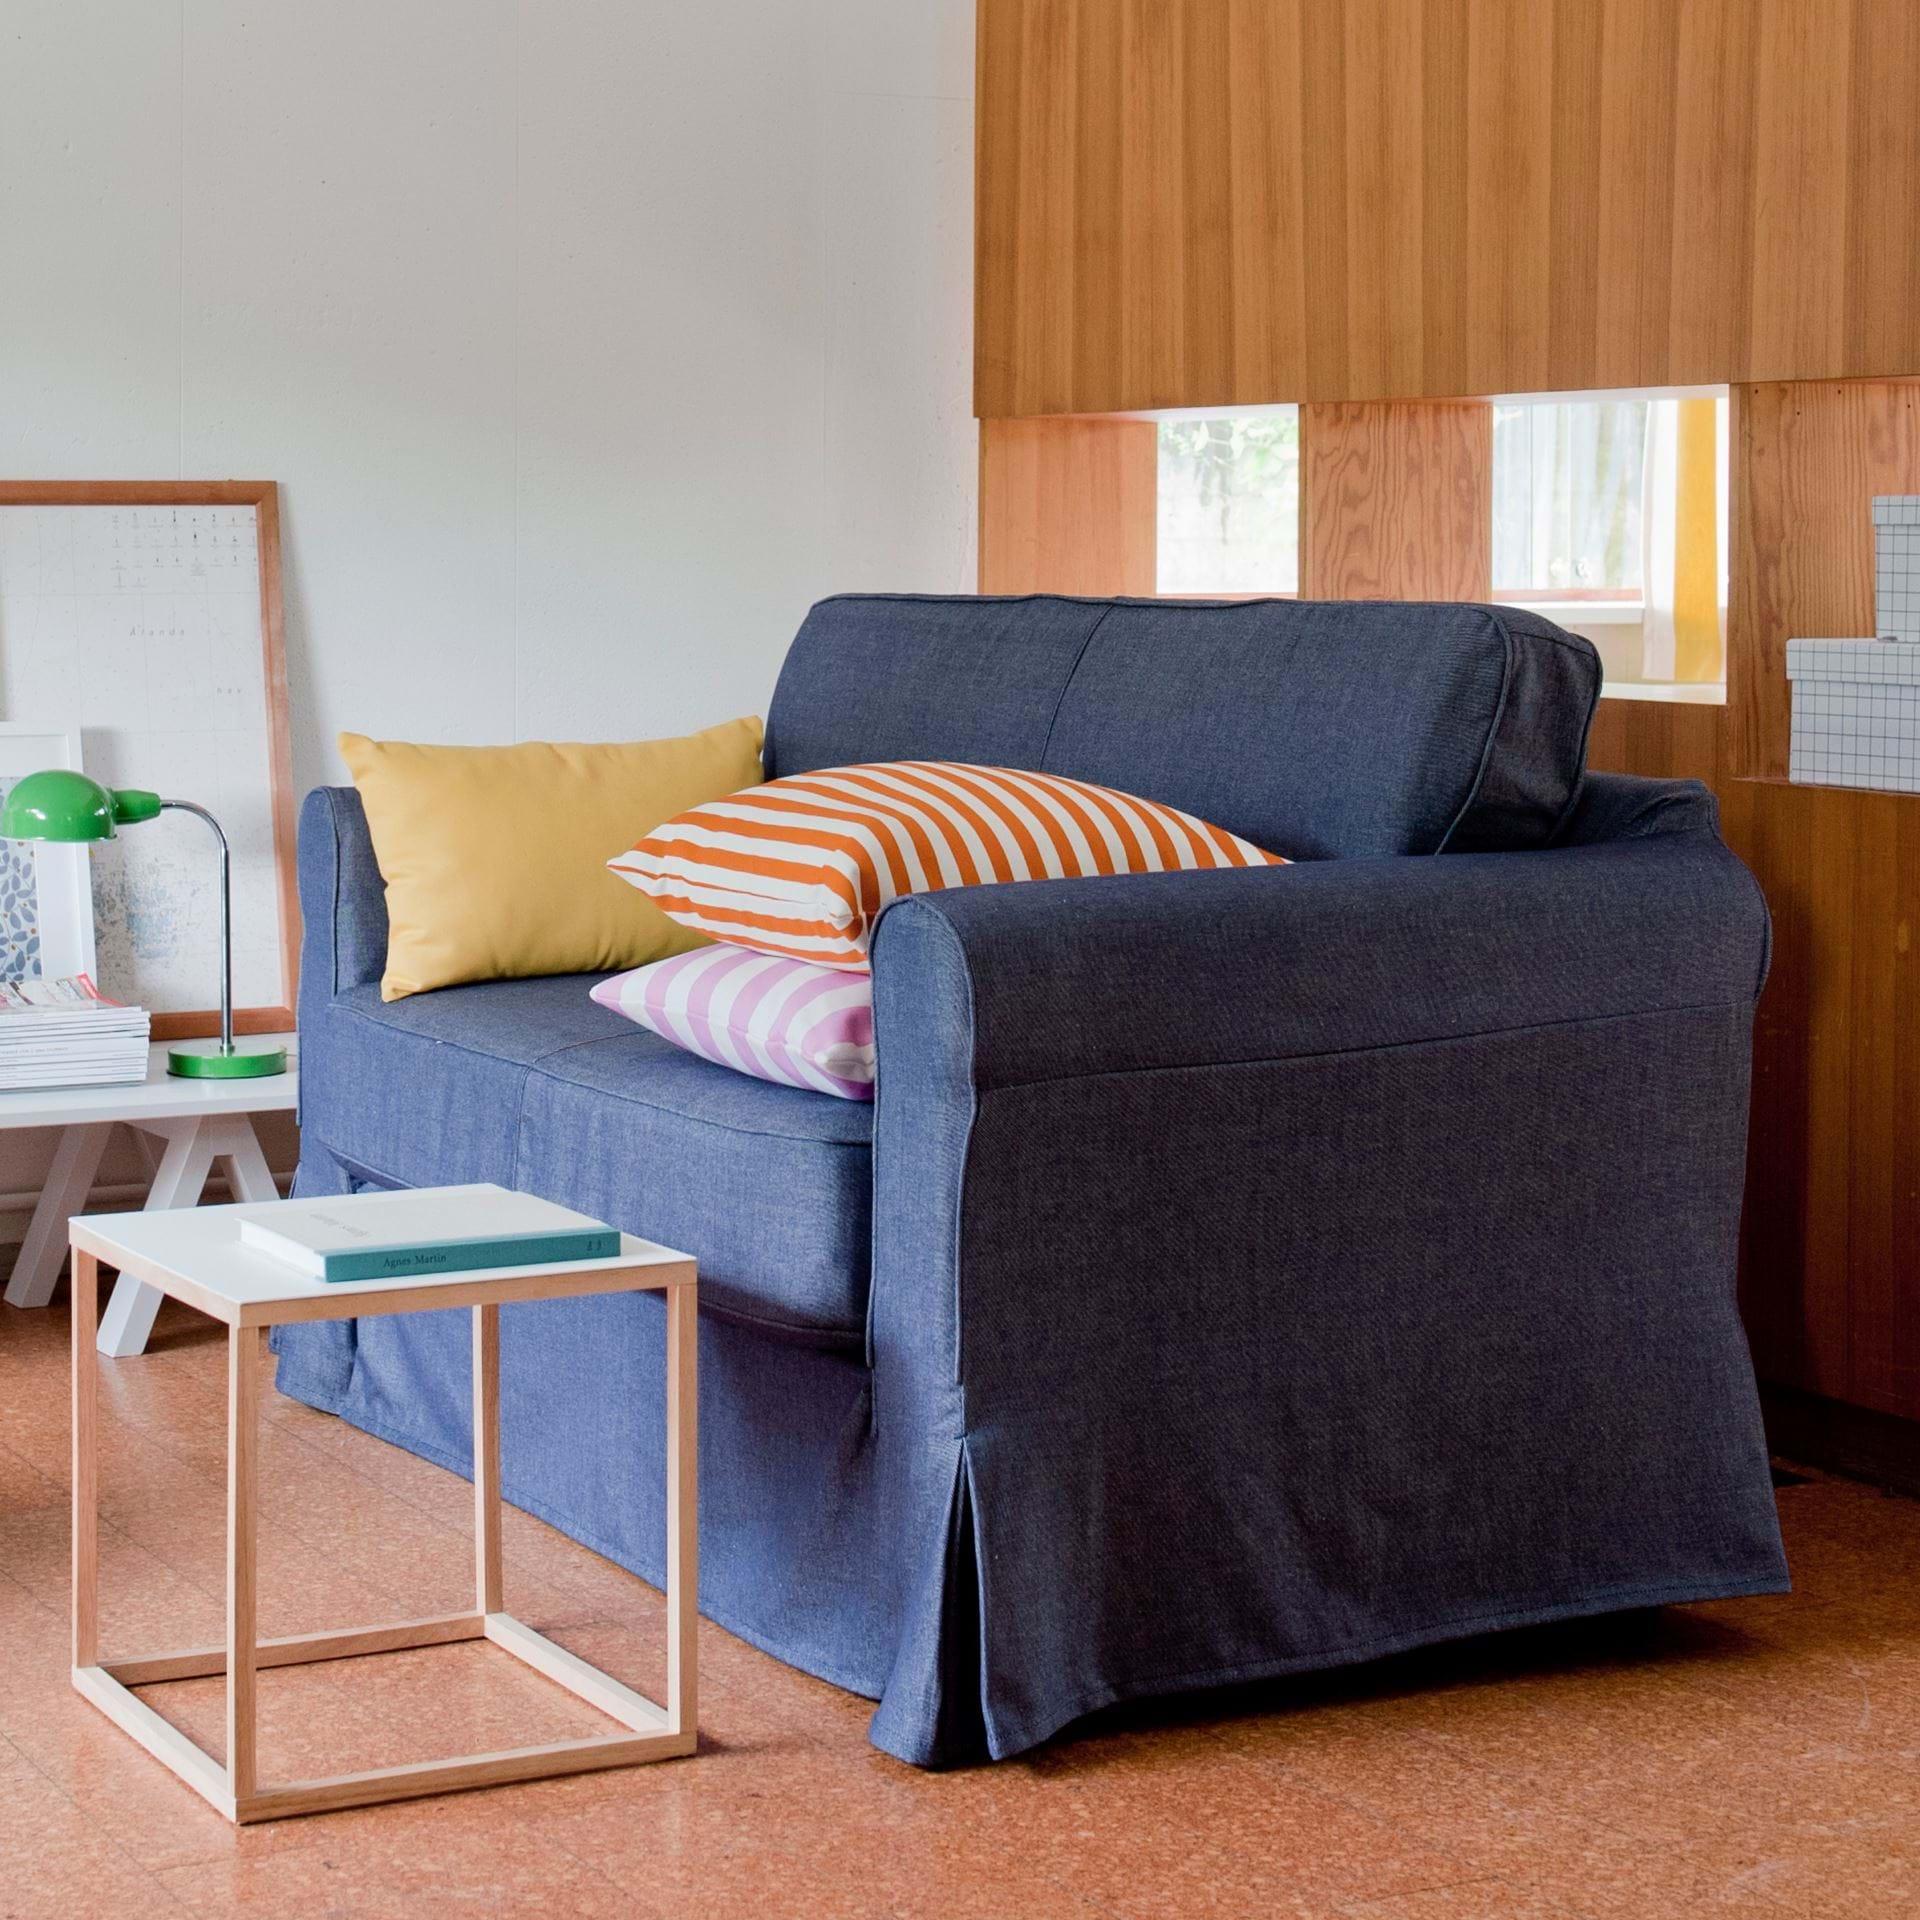 Fabulous Ikea Hagalund 2 Seater Sofa Bed Cover Bemz Bemz Inzonedesignstudio Interior Chair Design Inzonedesignstudiocom